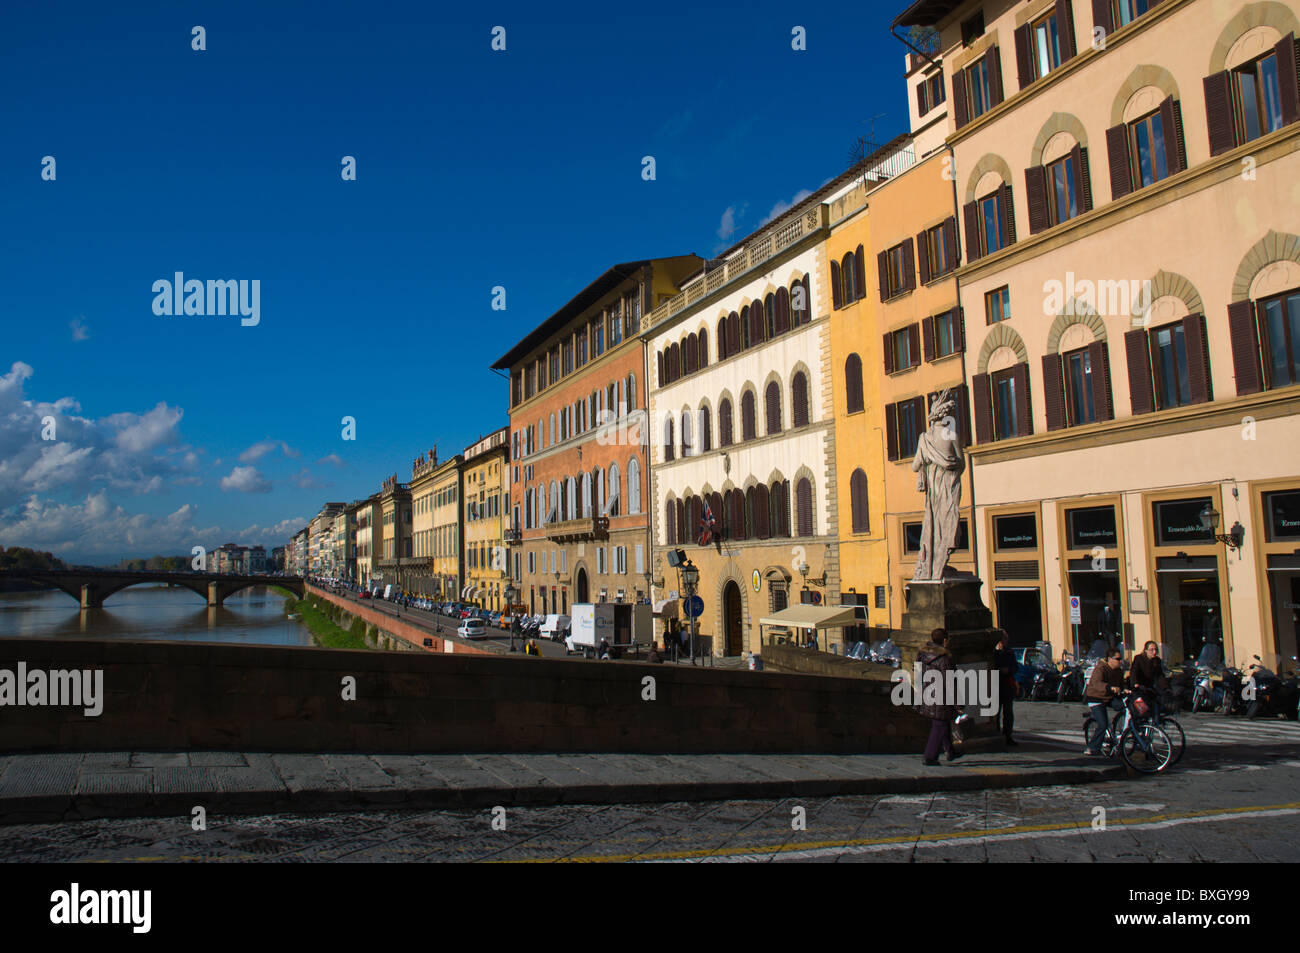 Ponte Trinita with riverside buildings Santo Spirito district Florence (Firenze) Tuscany central Italy Europe - Stock Image